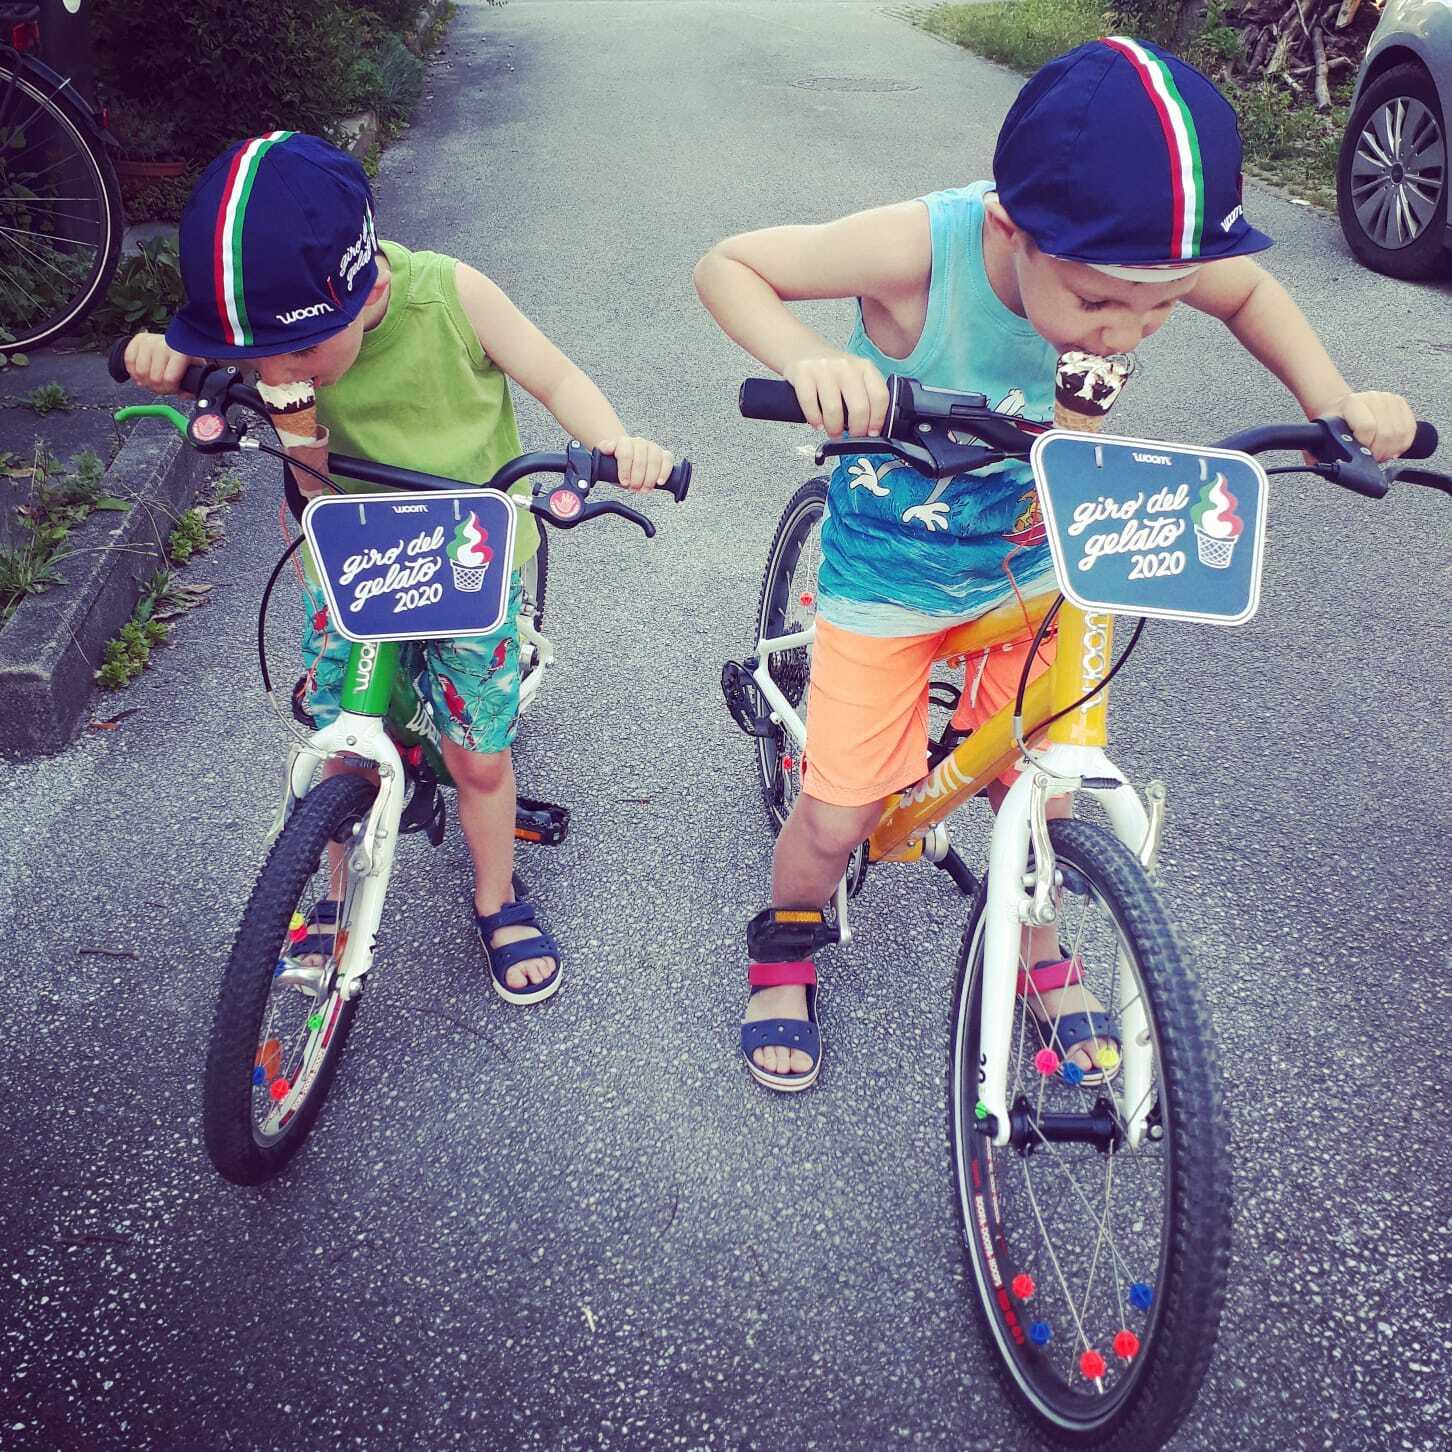 Zwei Giro del Gelato Teilnehmer